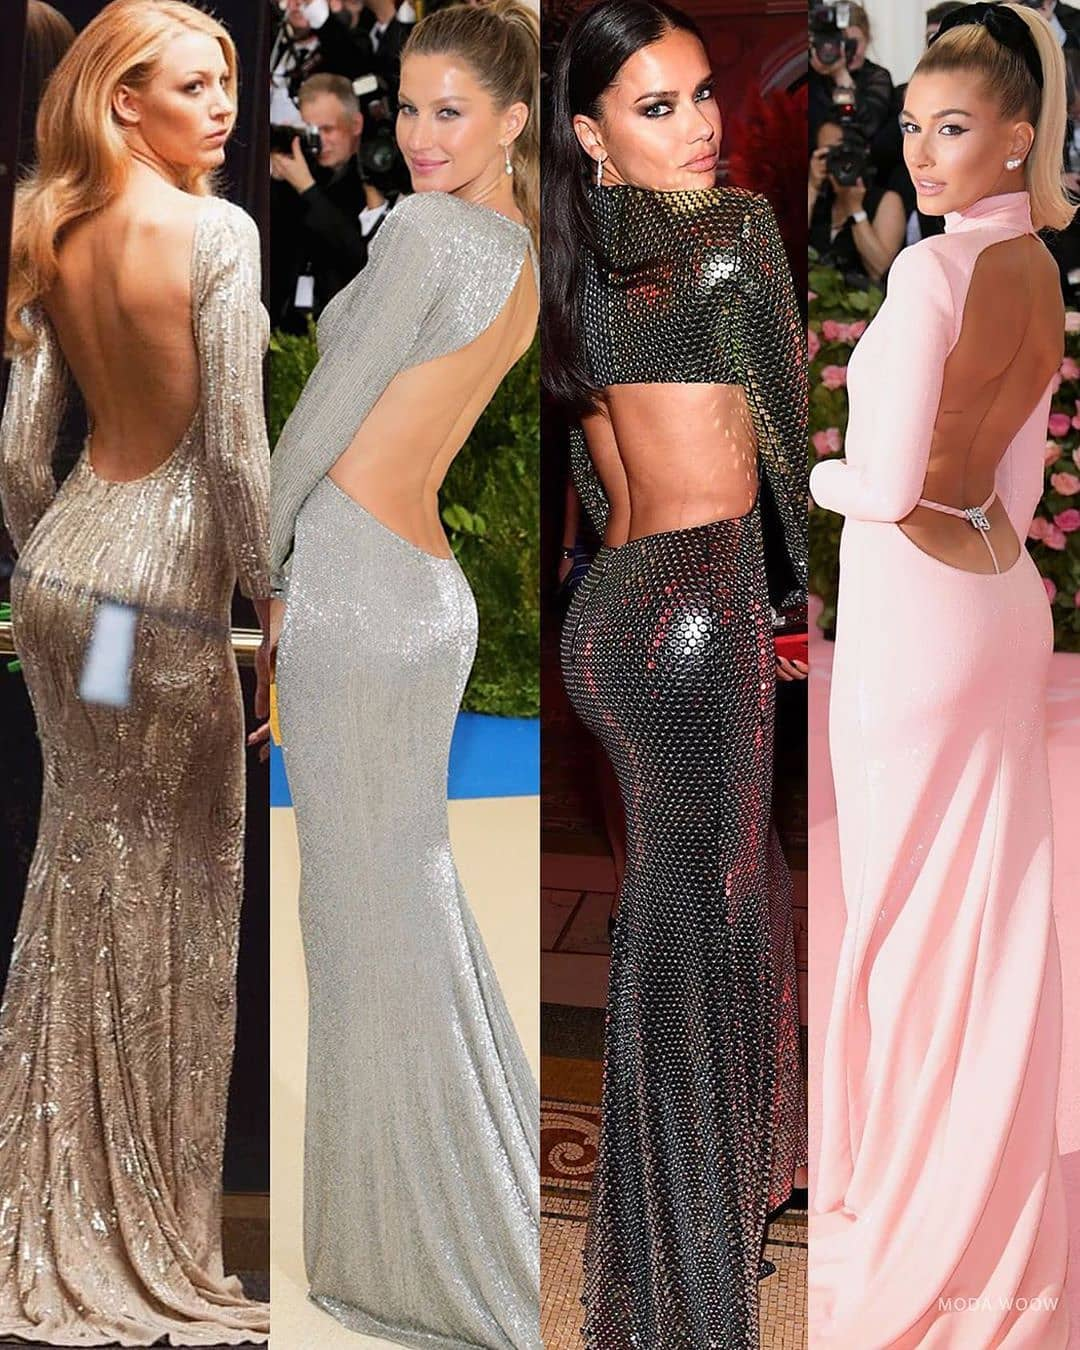 The Best Bling Online. Long Glittering Backless Full Sleeves Evening Gowns.